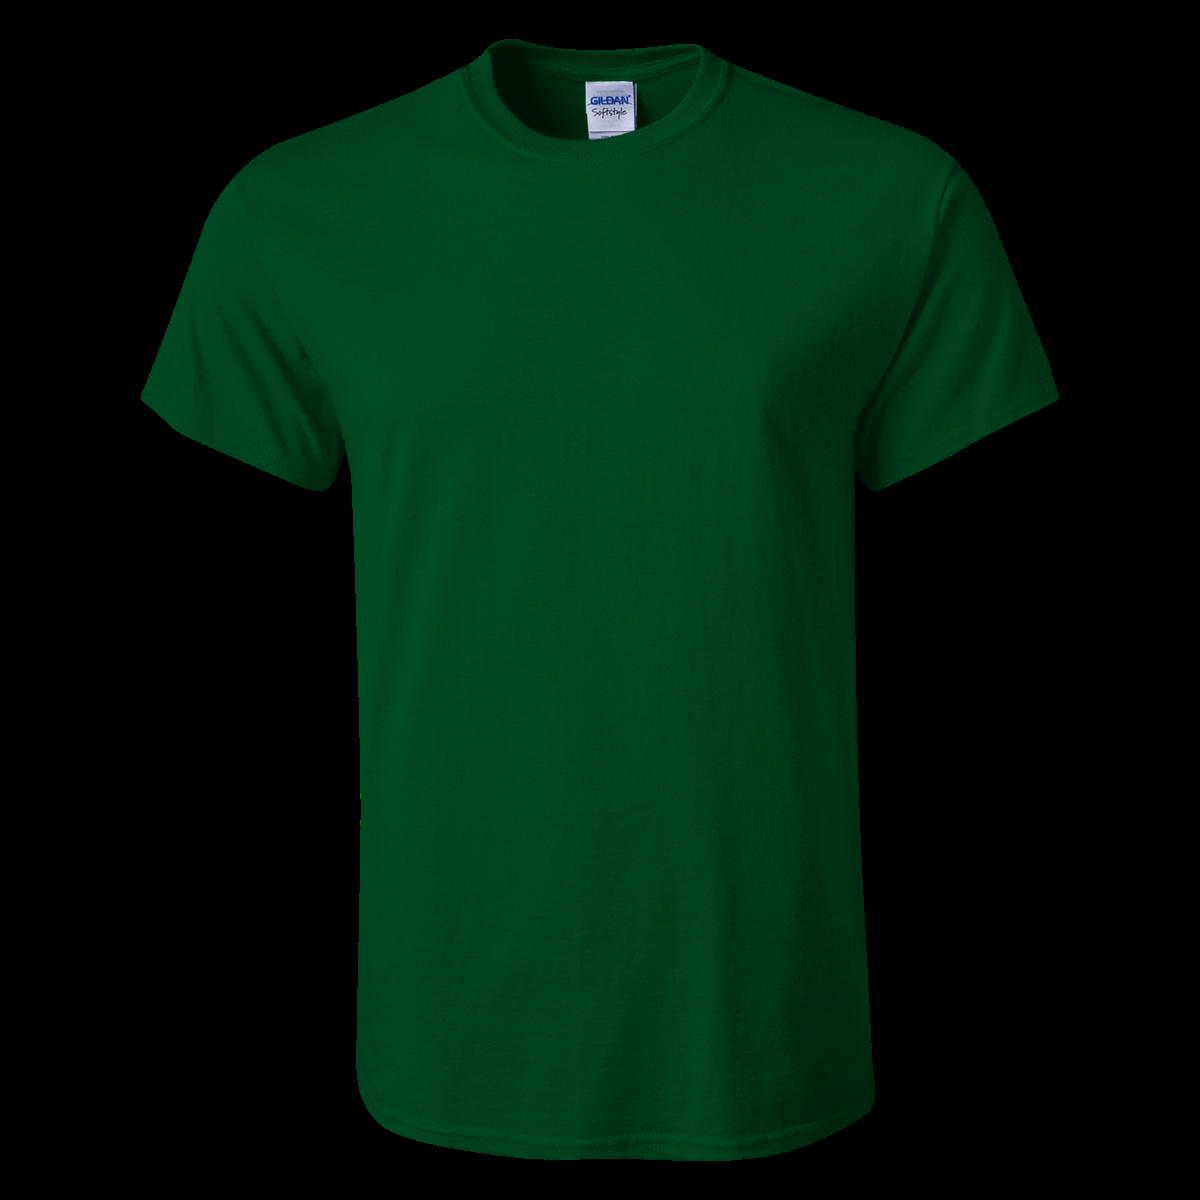 Gildan Softstyle T Shirt Dk Green S Kaos T Shirt Hijau